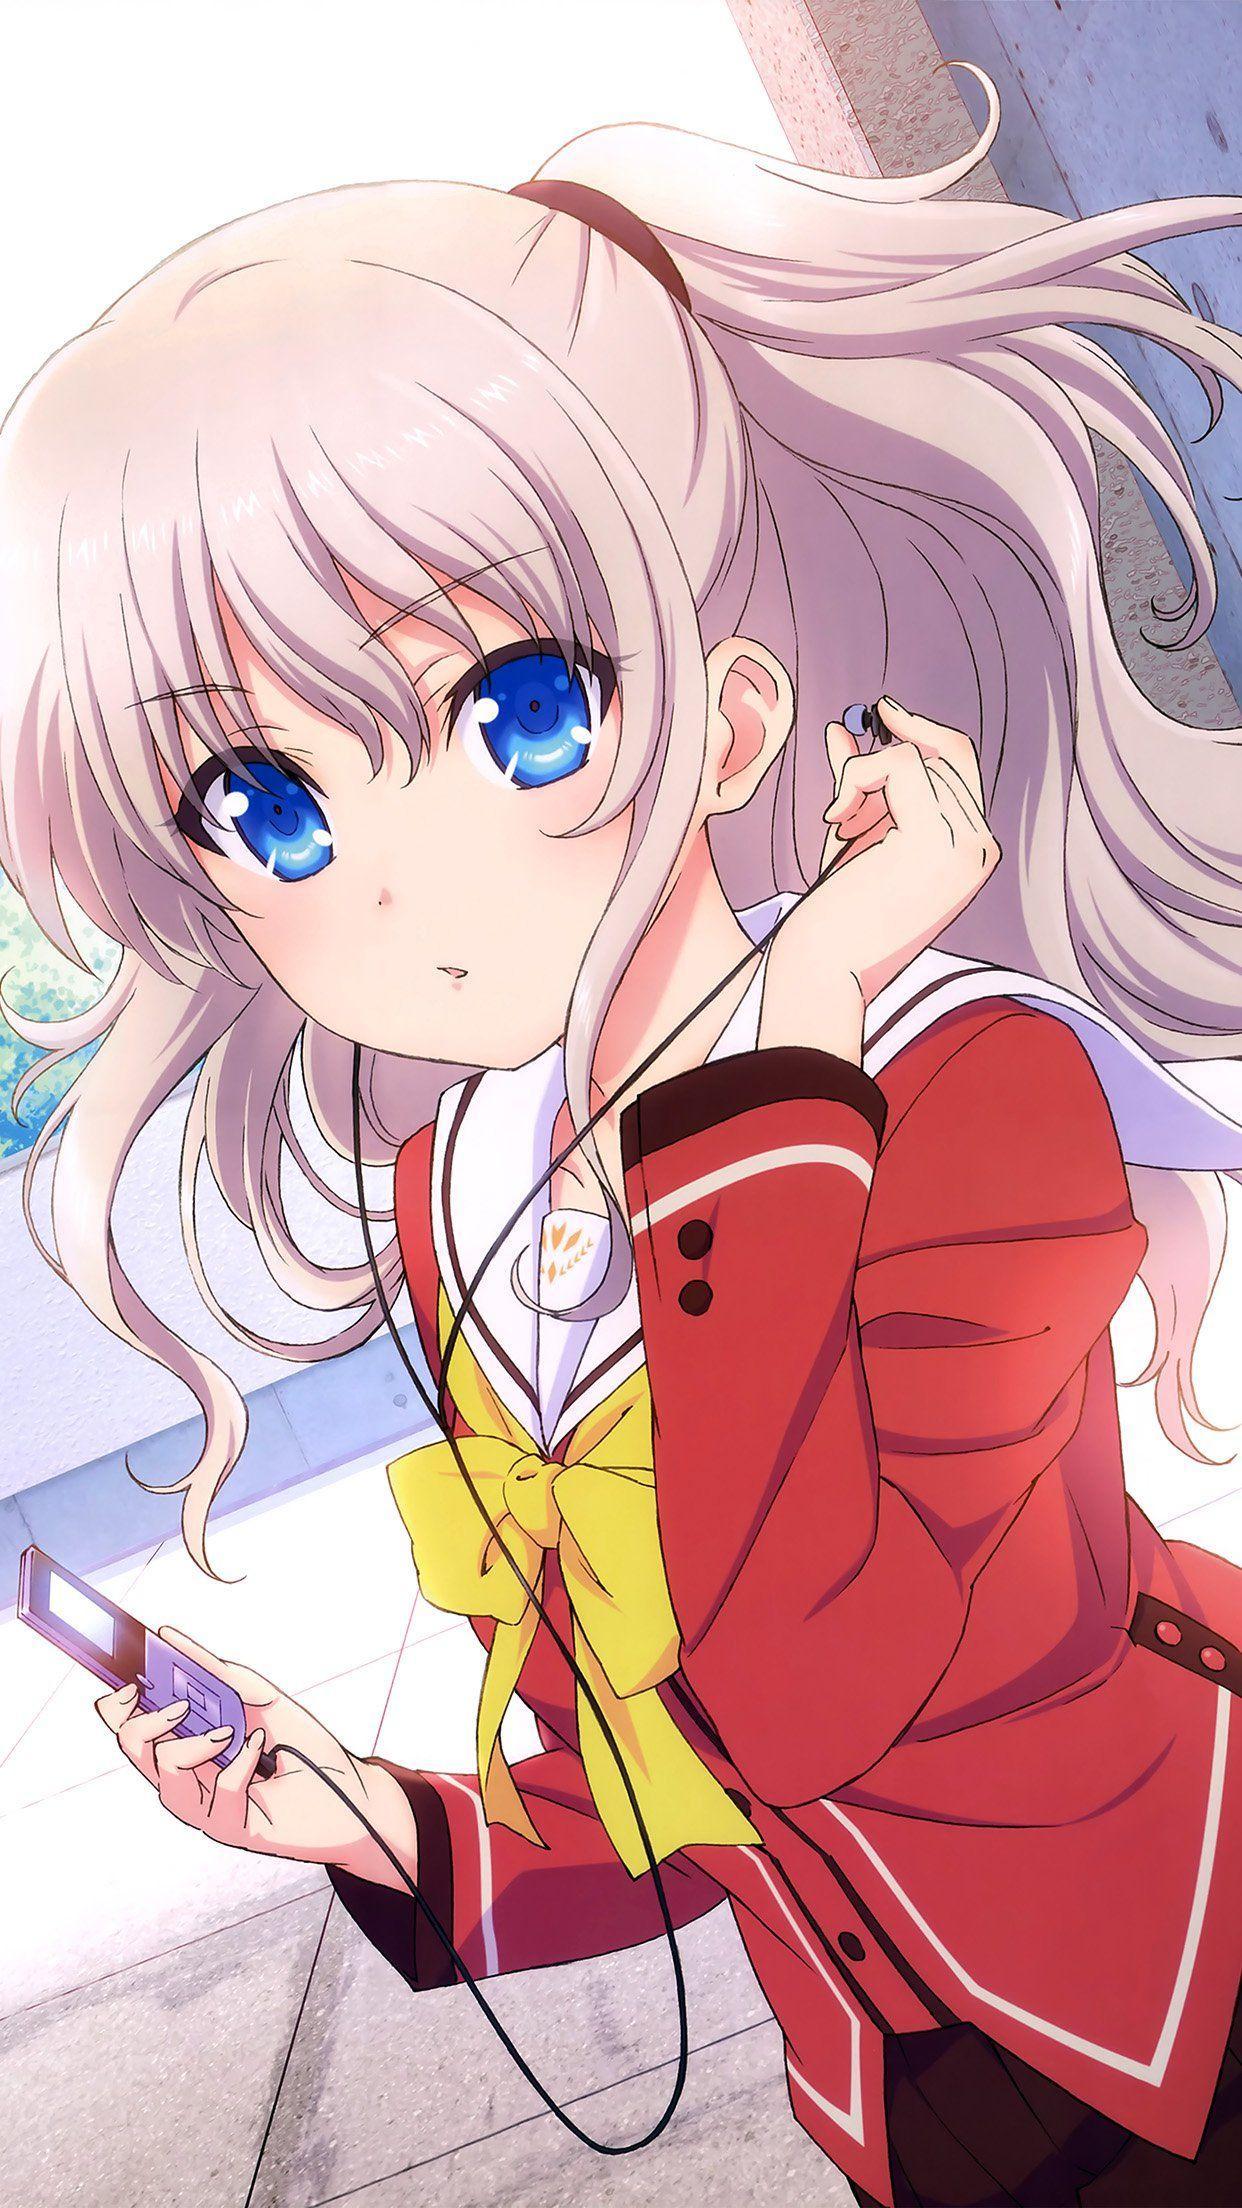 Cute Anime Girl Wallpaper Iphone : anime, wallpaper, iphone, Anime, IPhone, Wallpapers, Backgrounds, WallpaperAccess